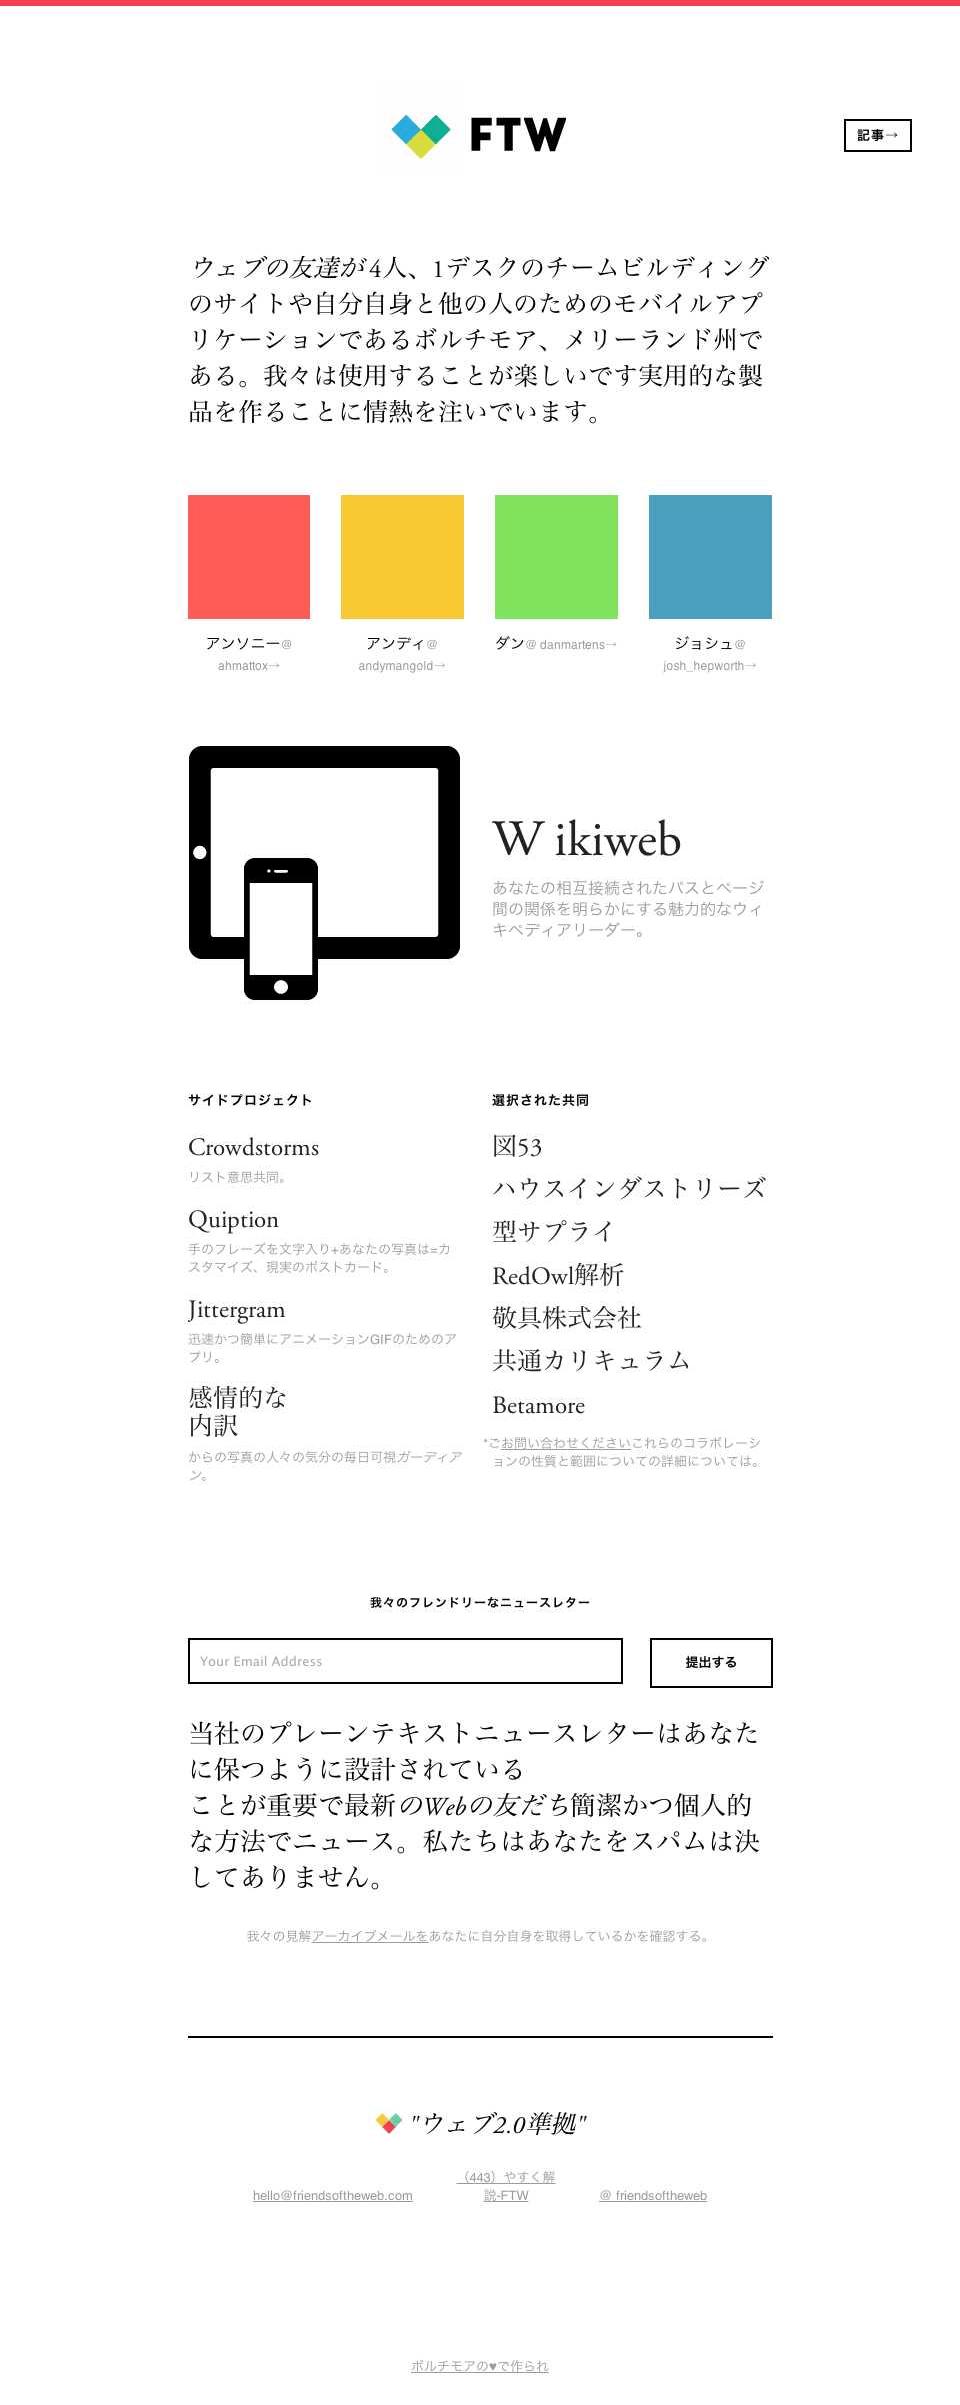 Friends of The Web, LLC